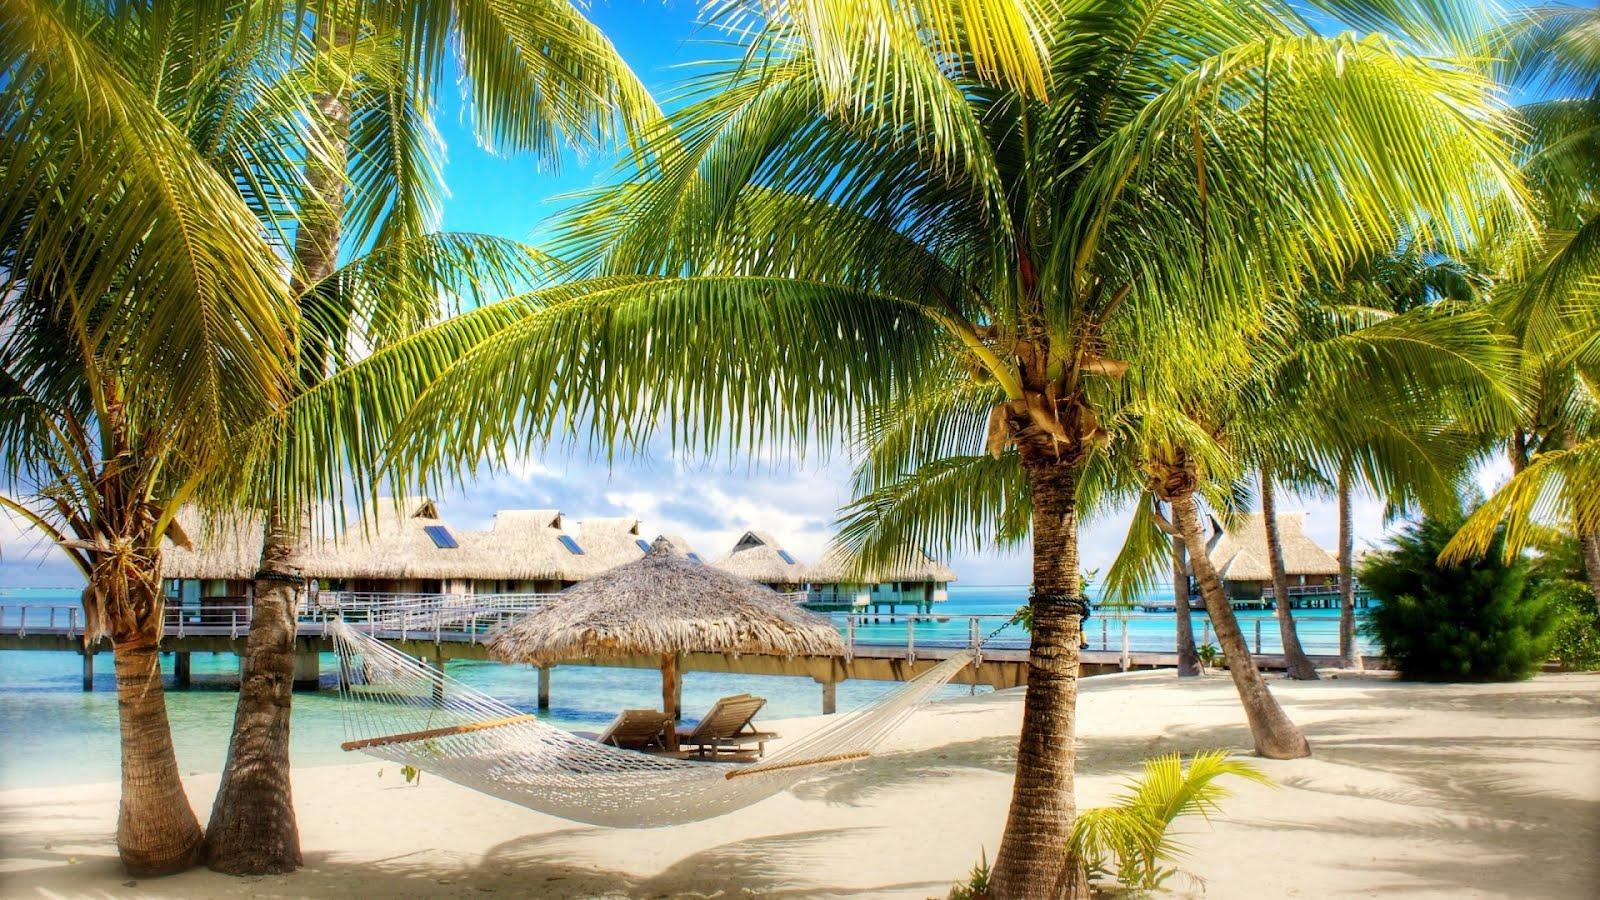 Tropical Beach Paradise Wallpaper Hd Desktop Wallpaper 1600x900